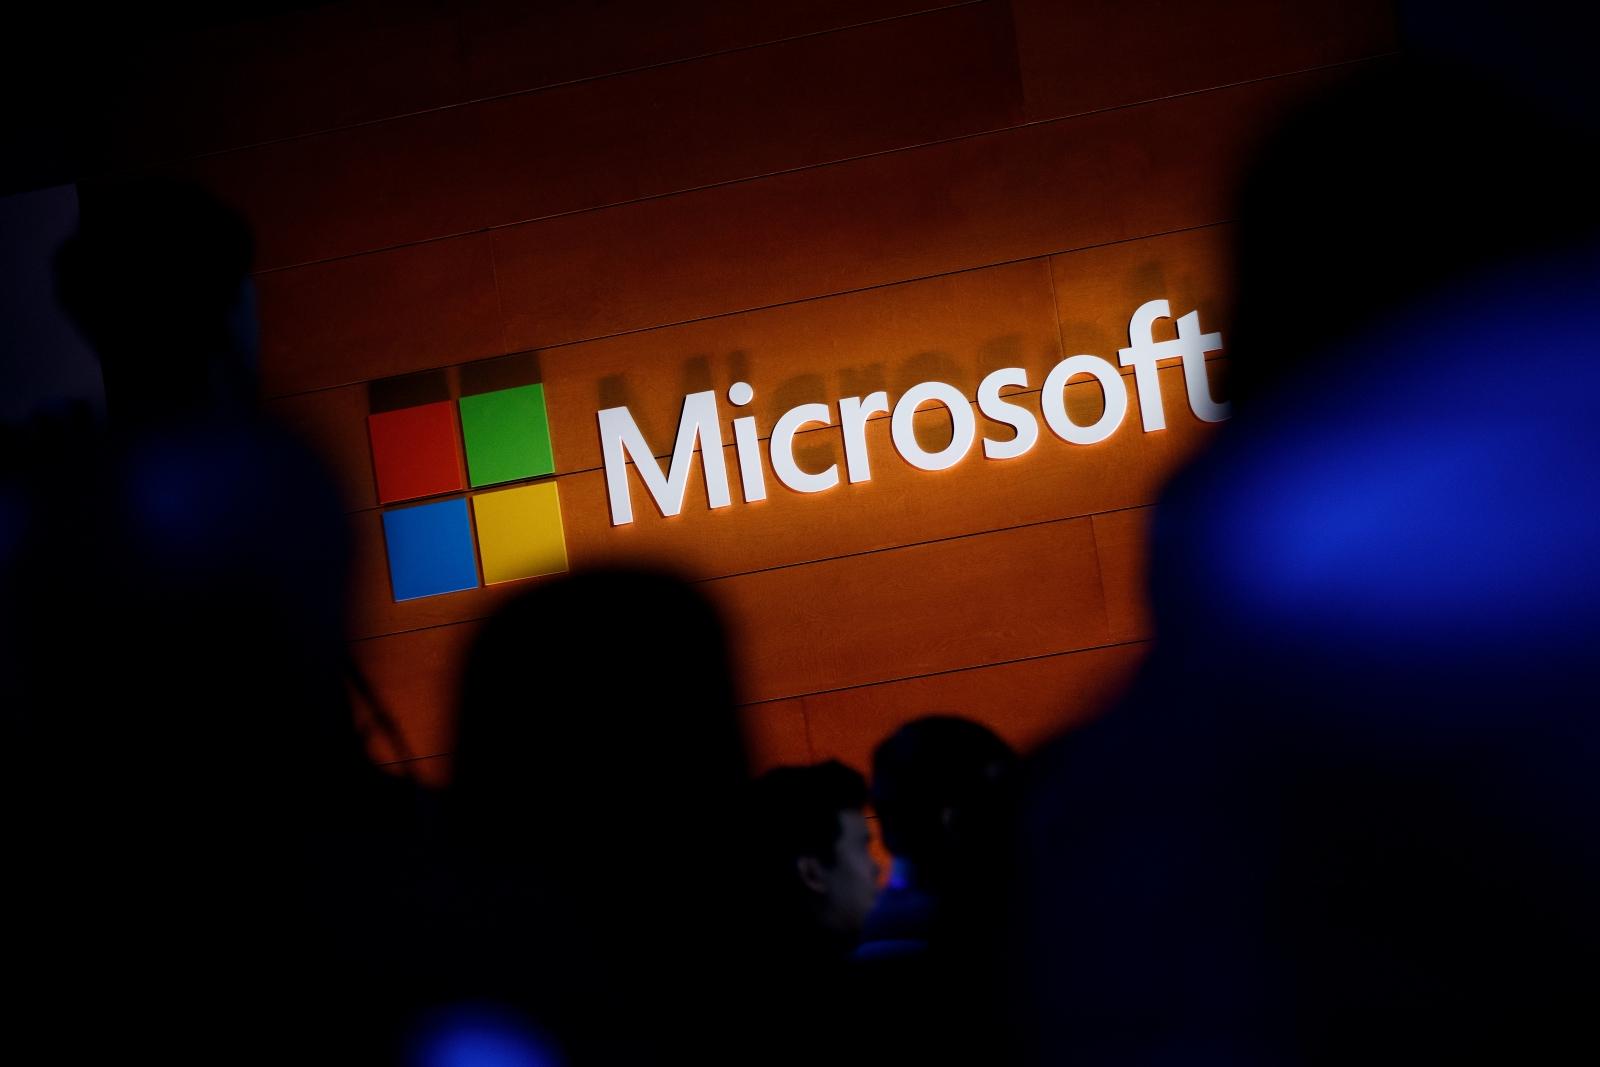 Windows 10 Fall Creators Update security features